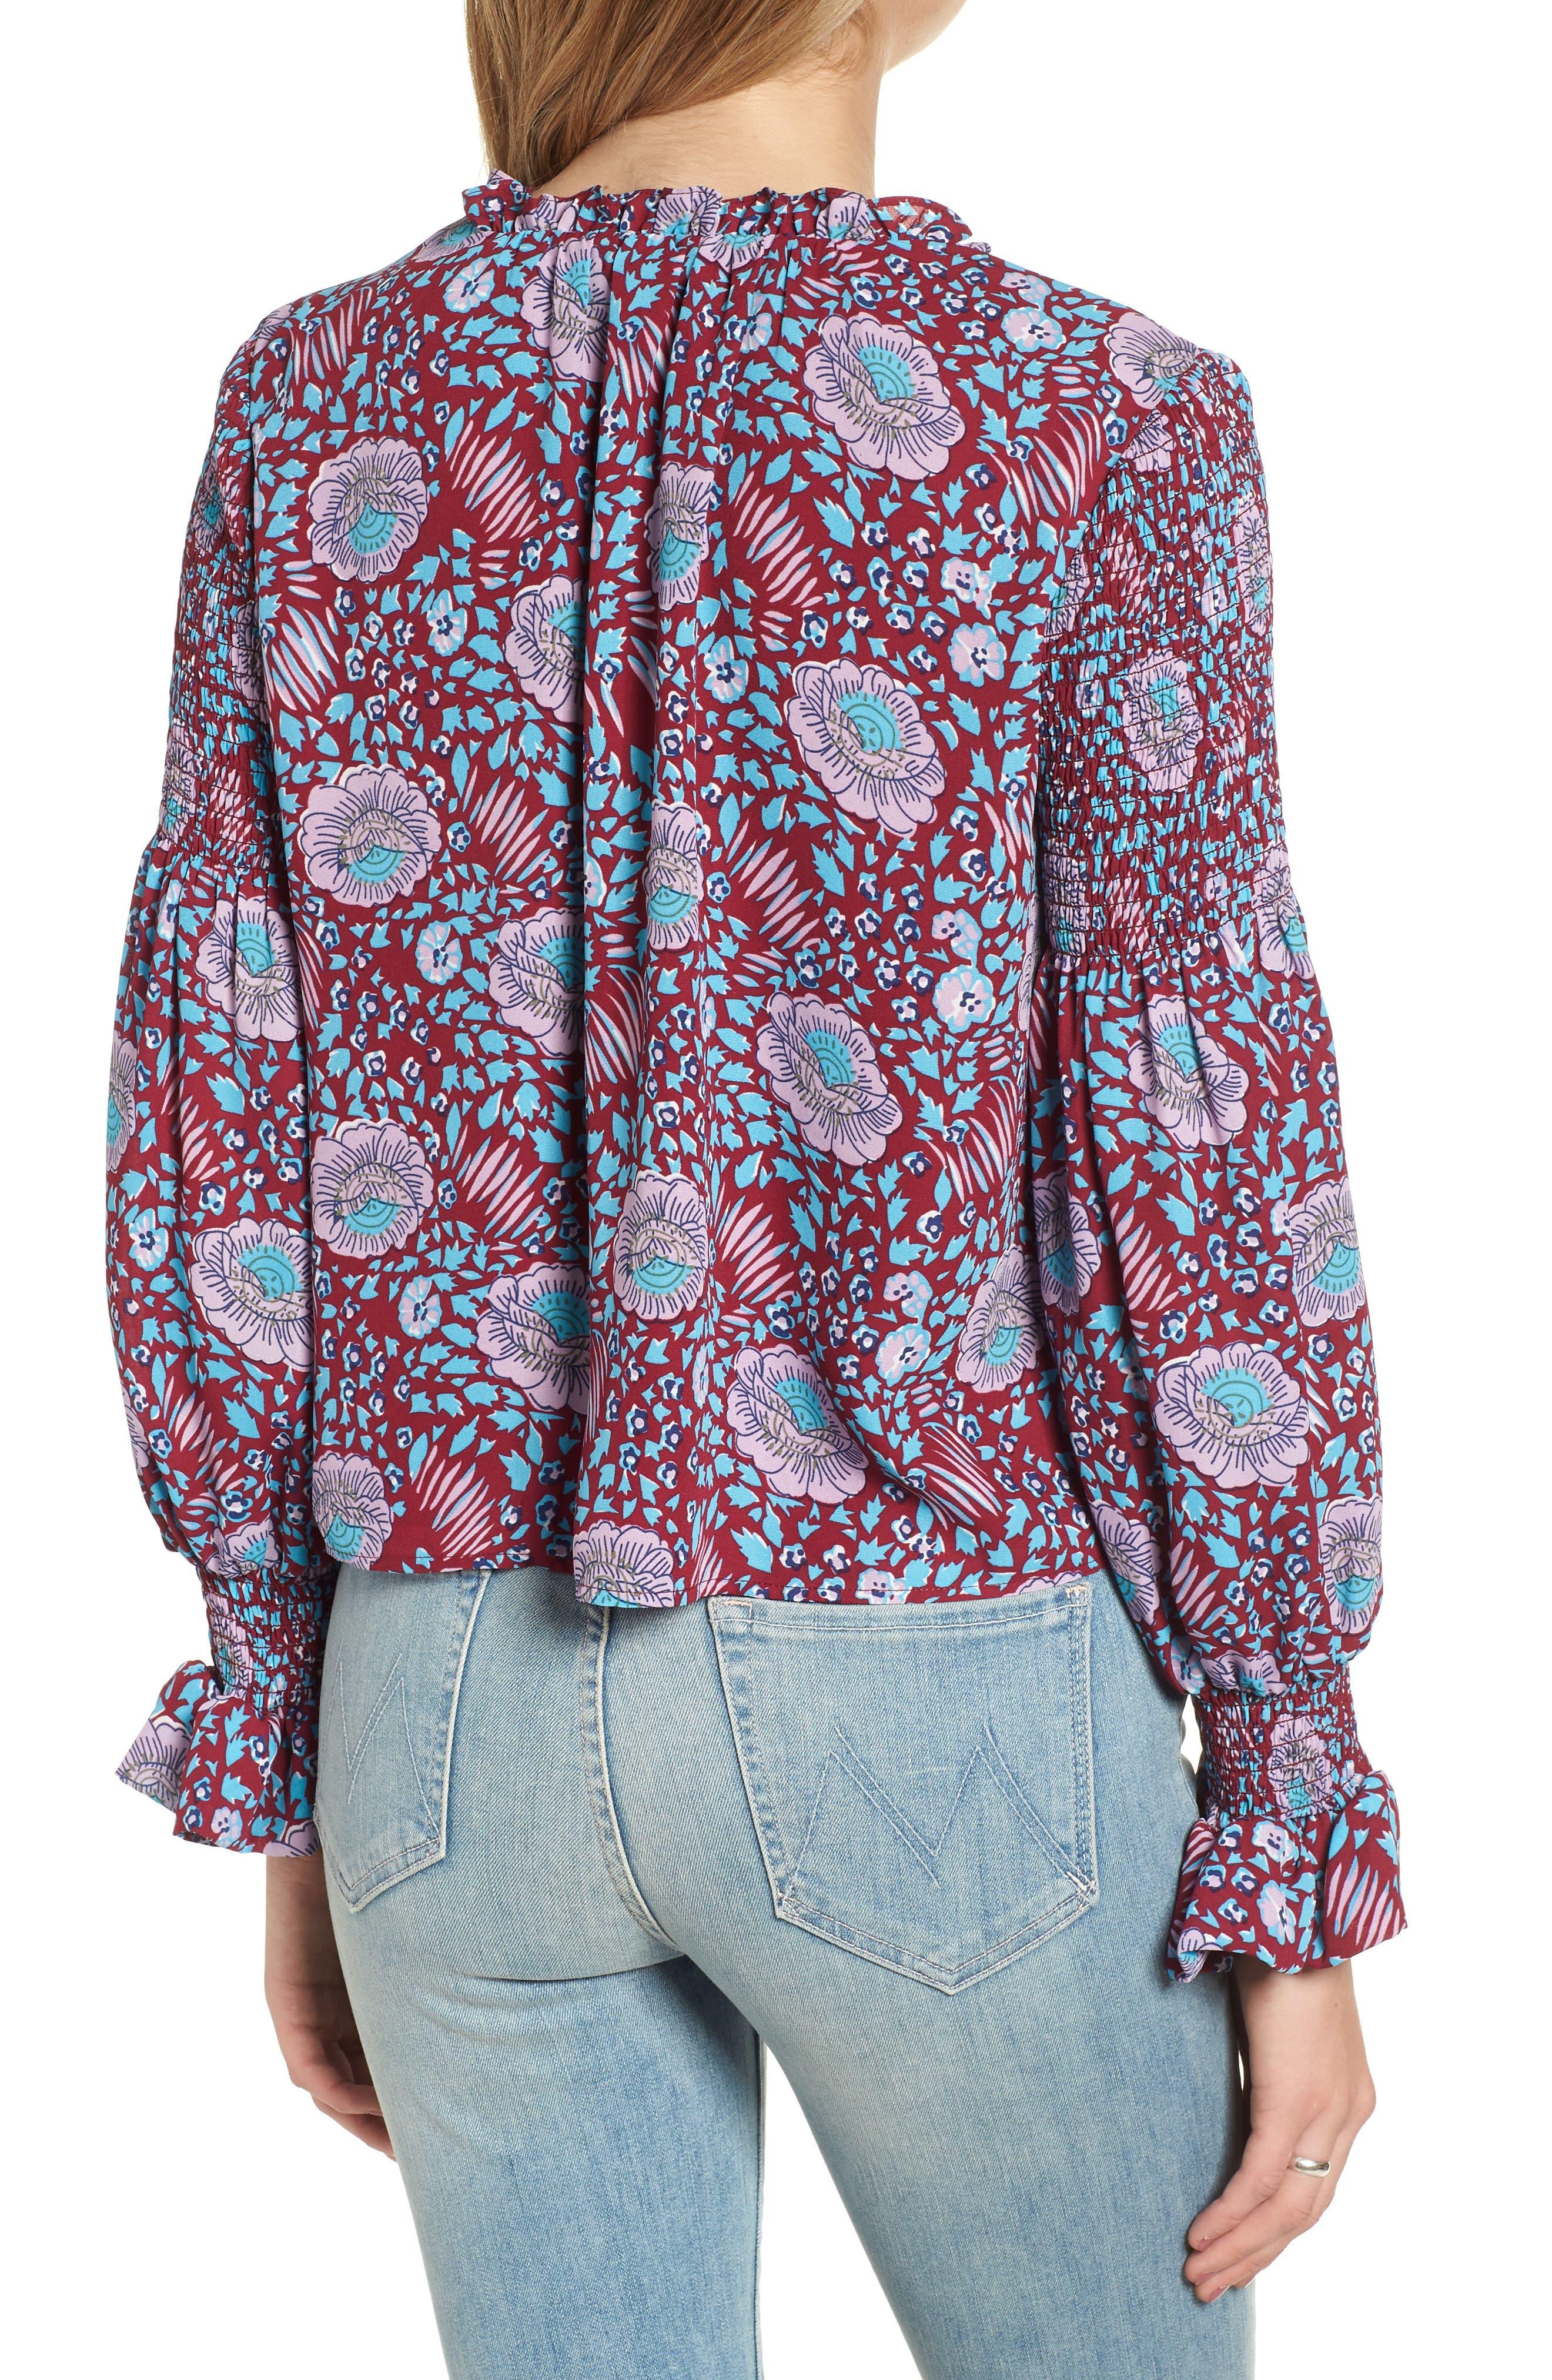 Penelope Floral Ruffle Top,                             Alternate thumbnail 2, color,                             DARK RED MULTI